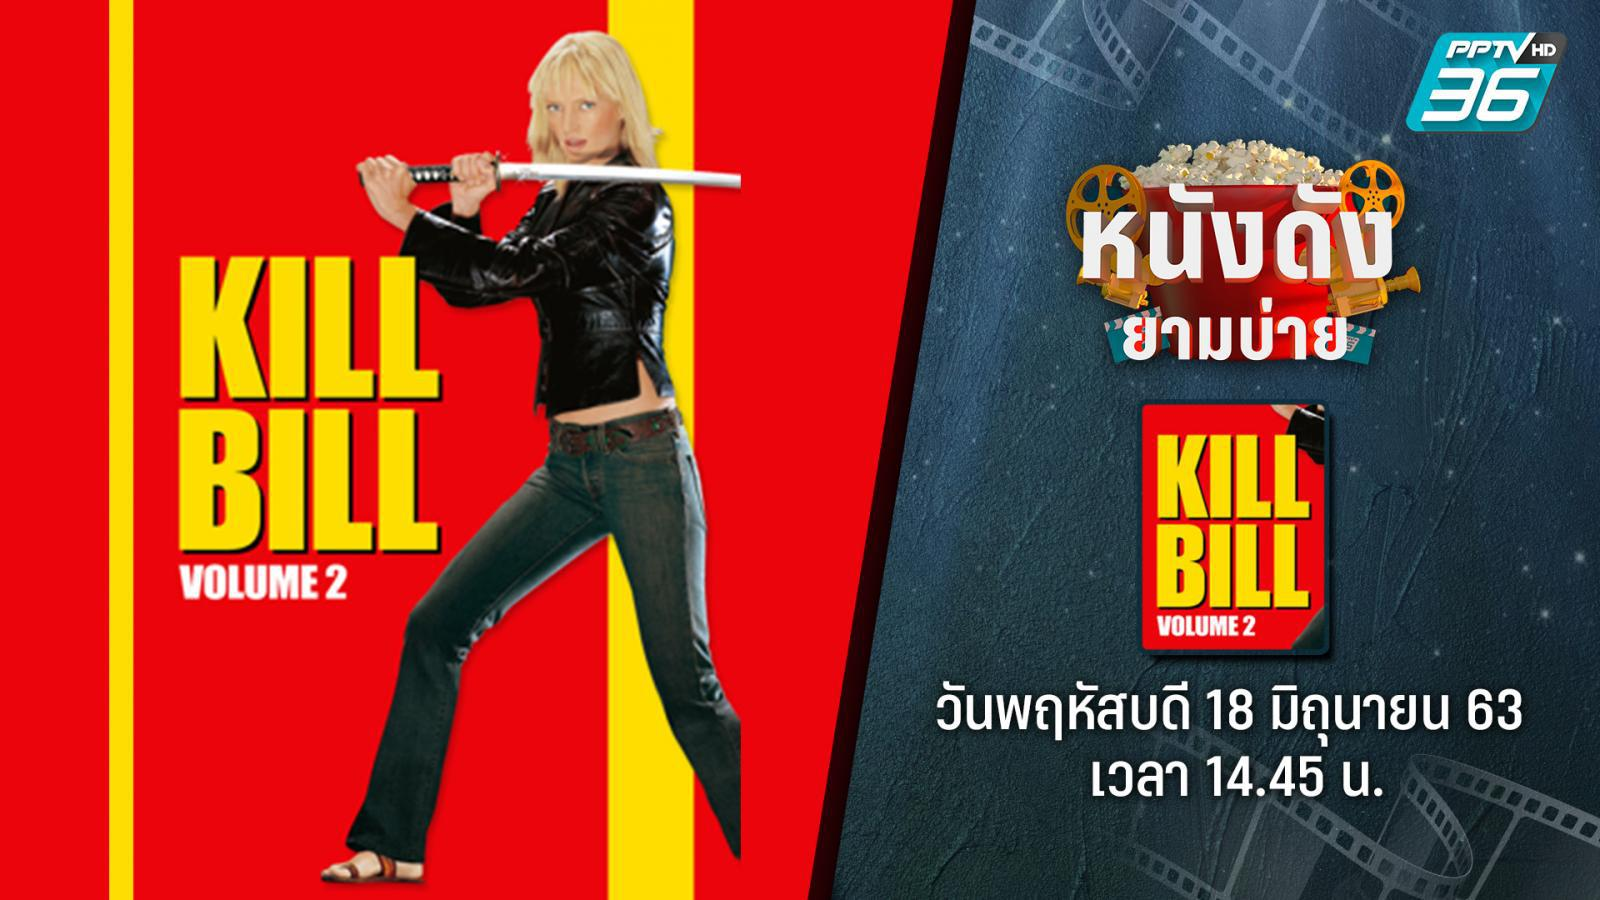 Kill Bill: Volume 2 นางฟ้าซามูไร 2